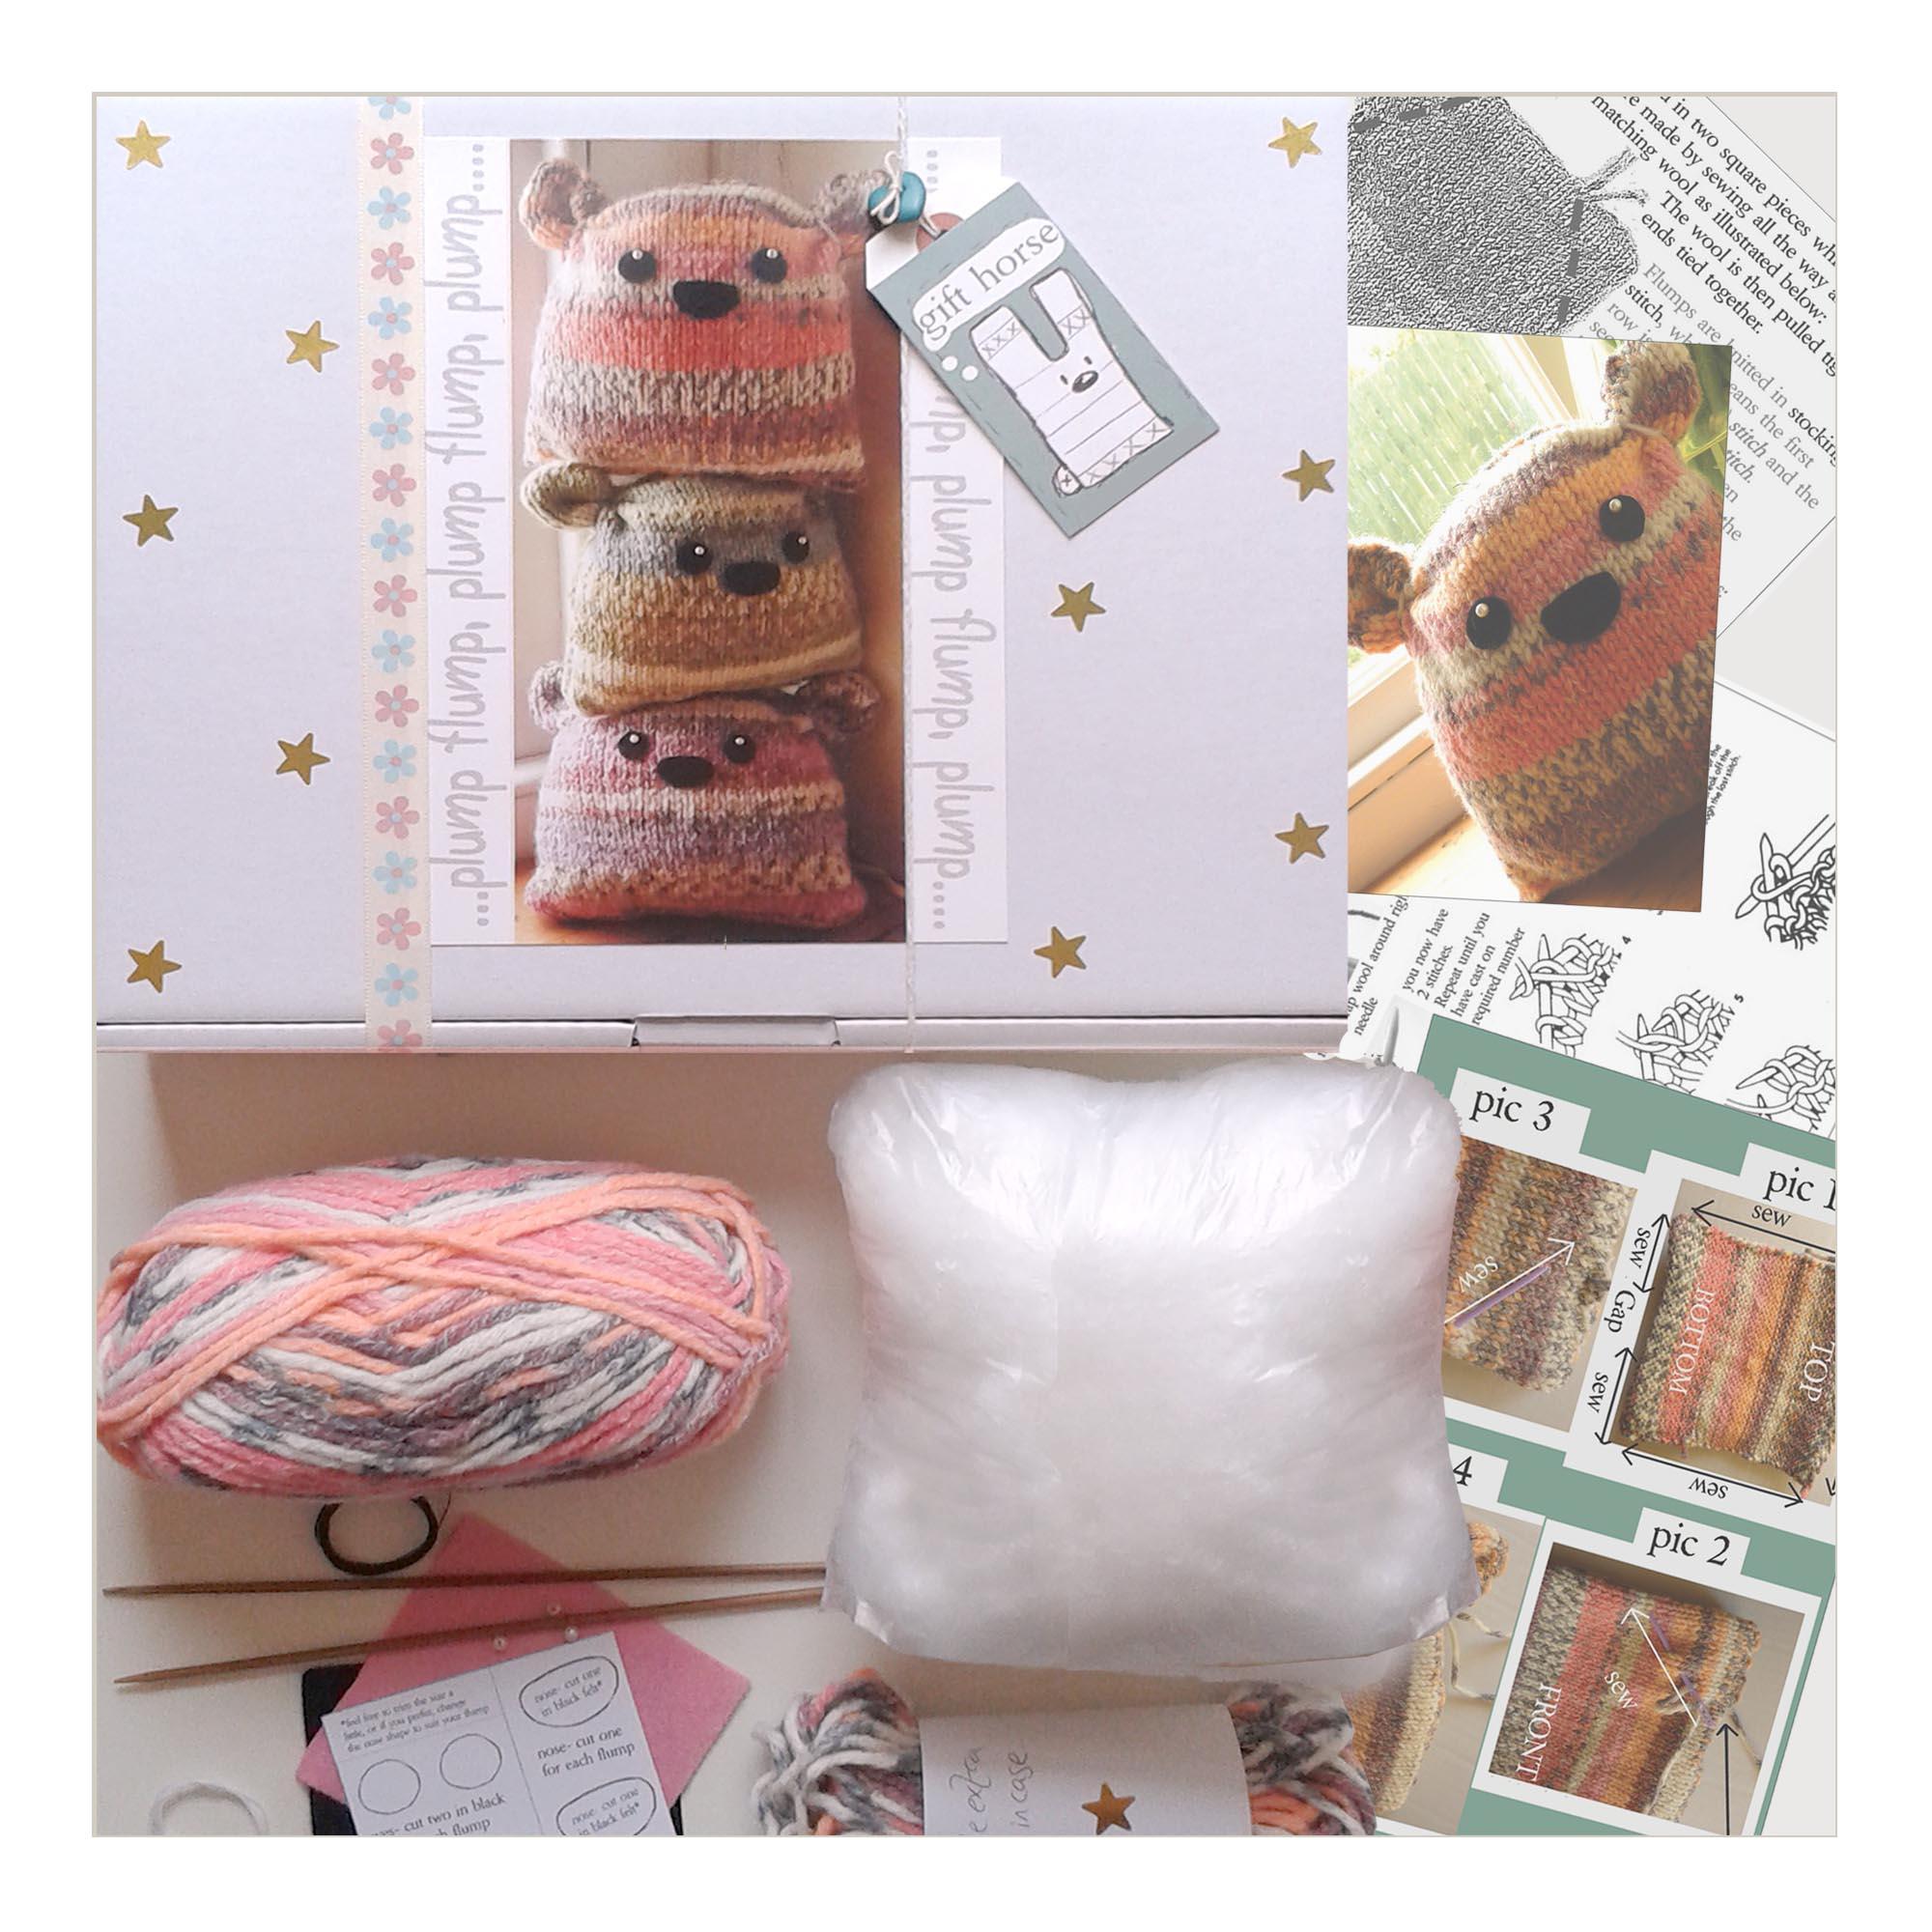 plump-flump-knitting-kit-contents.jpg